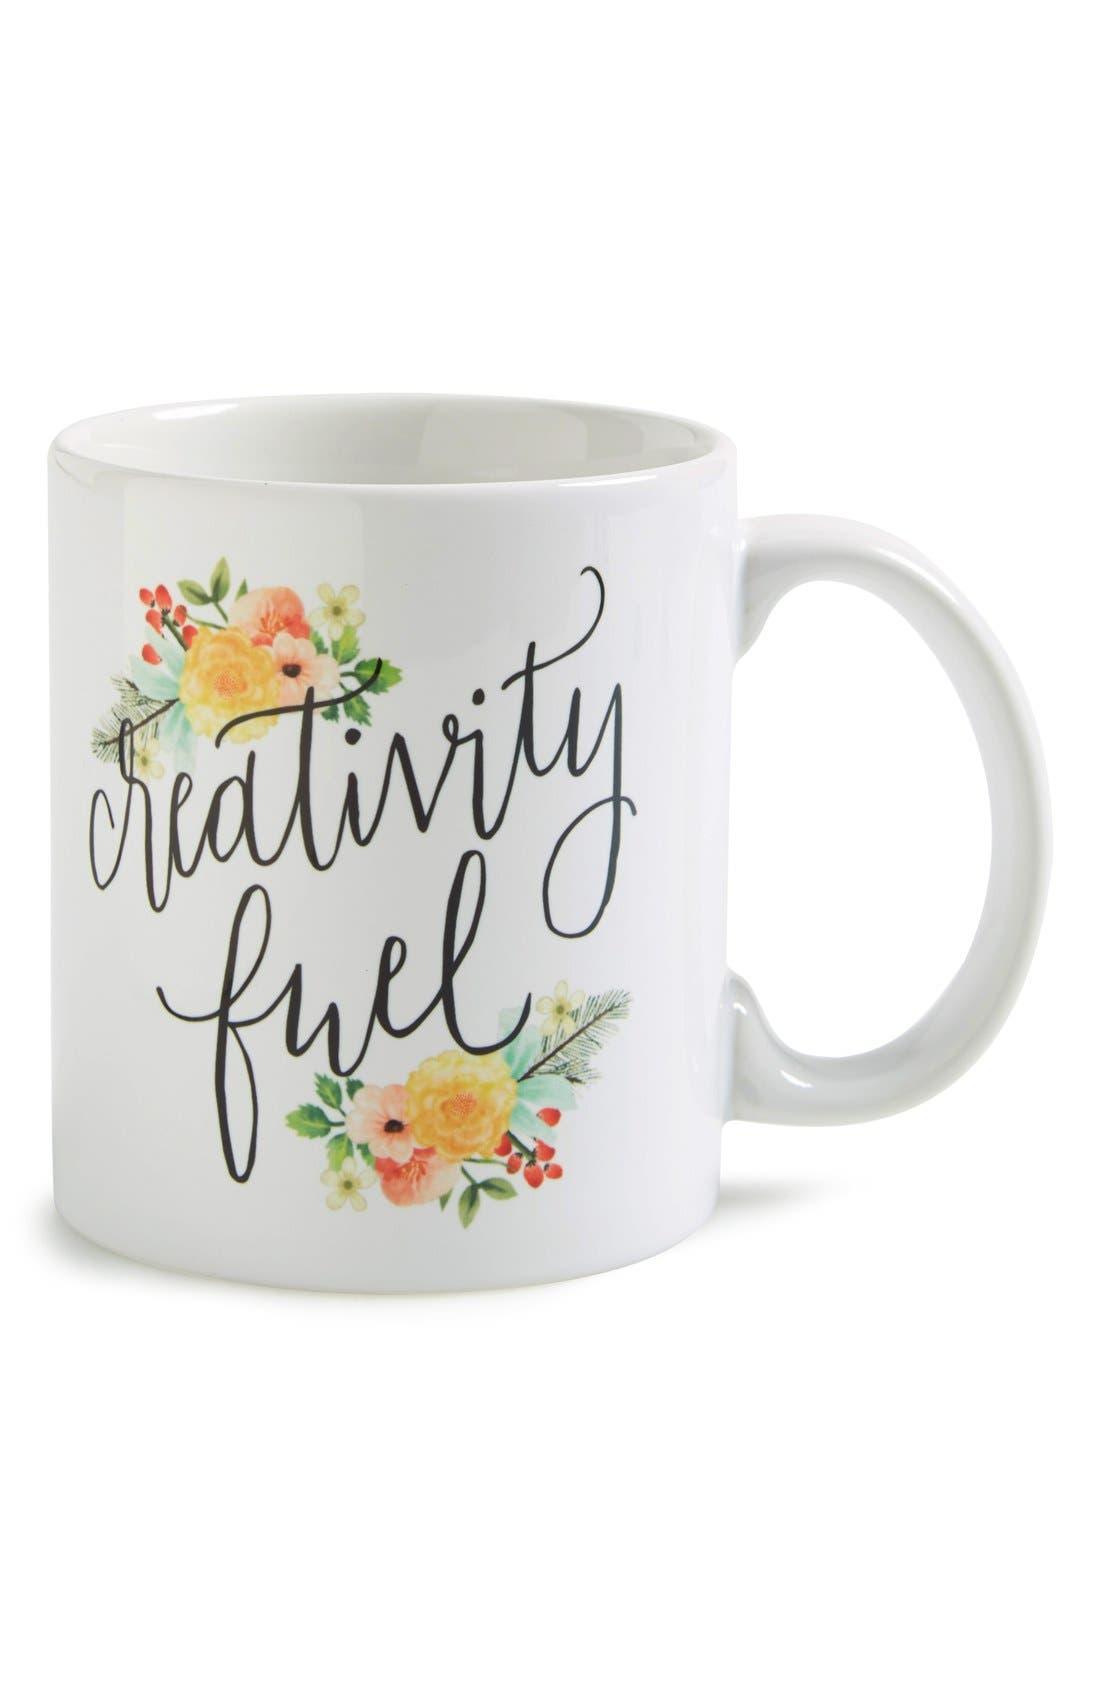 Alternate Image 1 Selected - Printable Wisdom 'Creativity Fuel' Mug